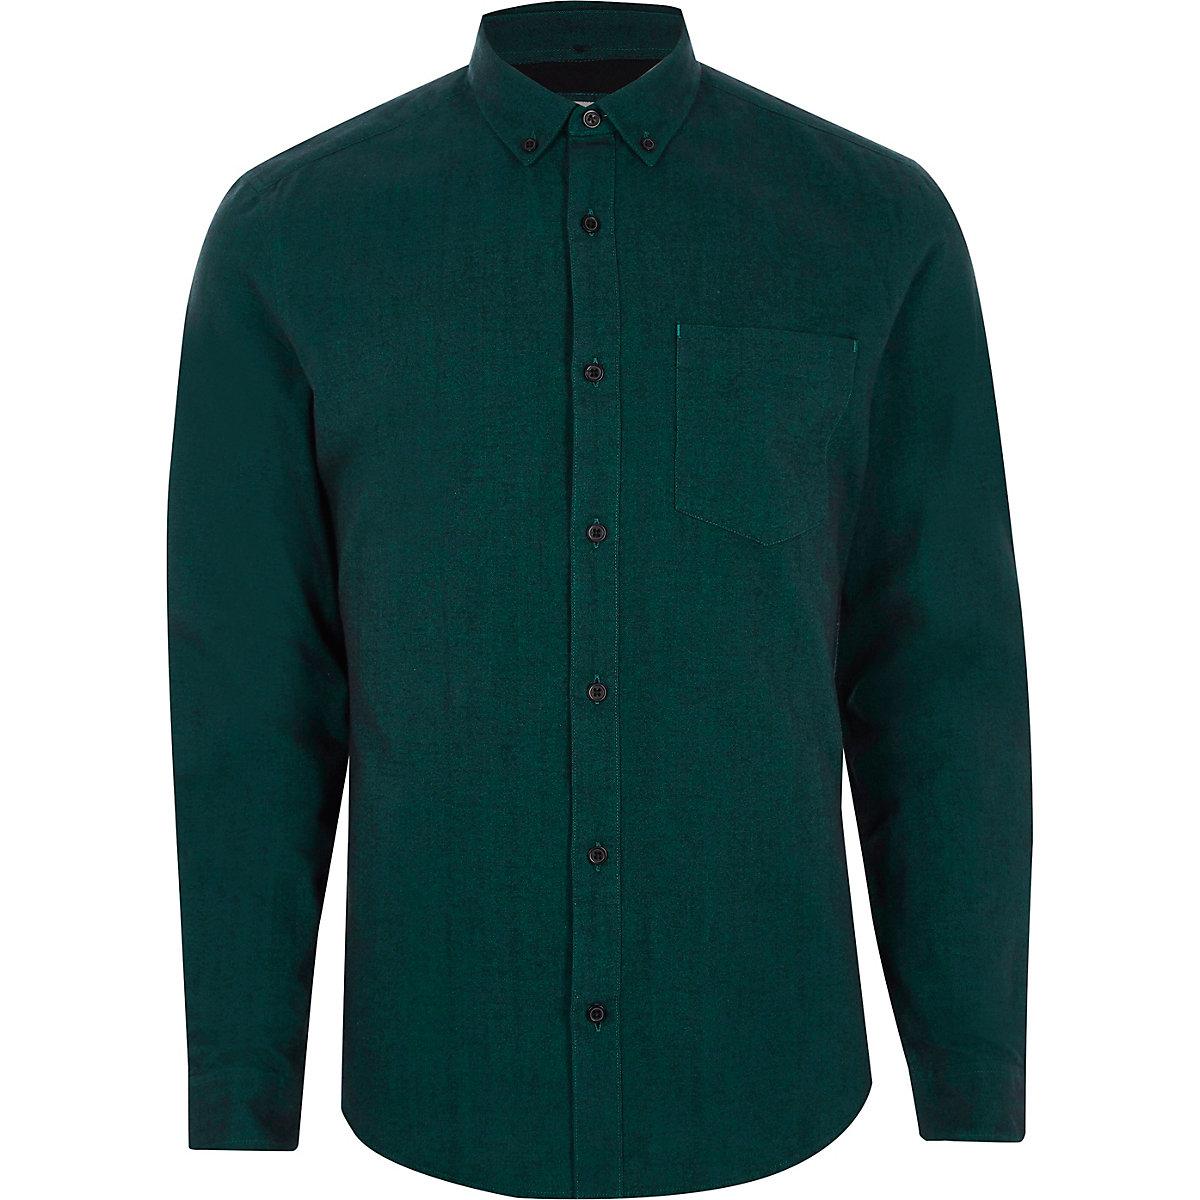 Teal slim fit long sleeve Oxford shirt